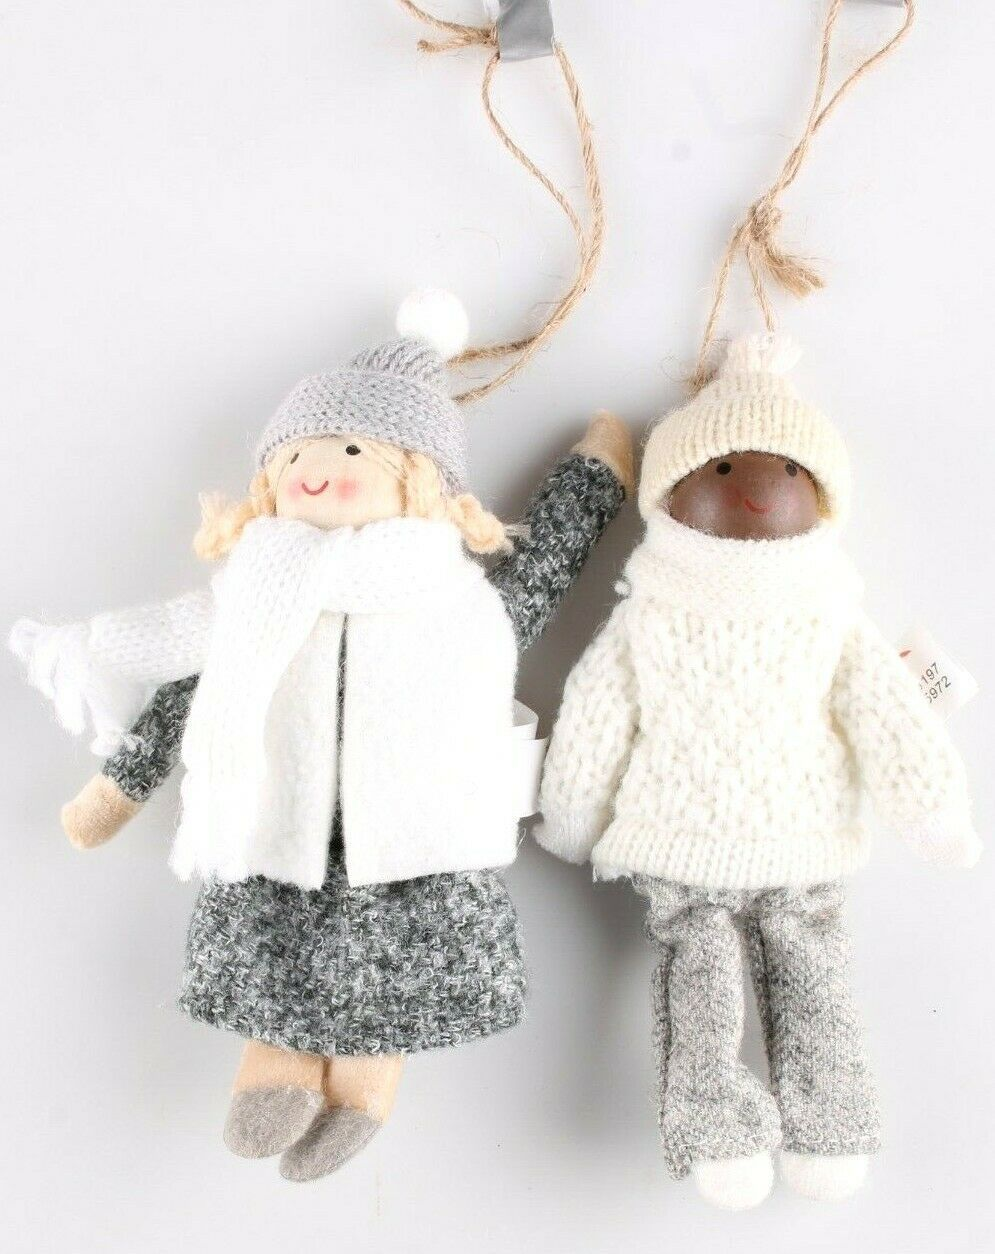 2 Birchwood Bay Fabric African American + White w Hats Girls Christmas Ornament